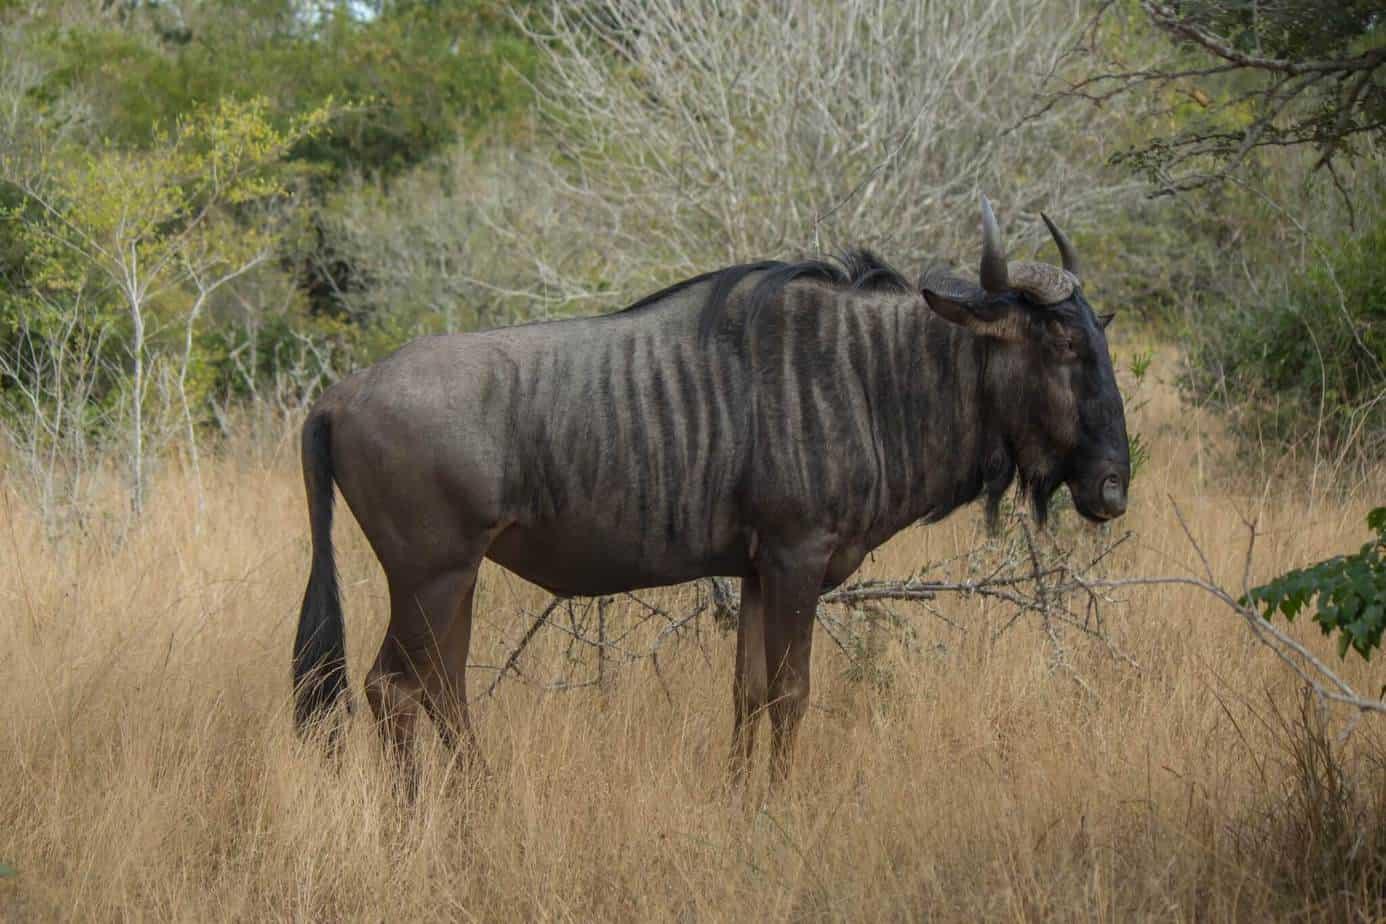 Blue Wildebeest @ Tembe Elephant Park. Photo: Håvard Rosenlund